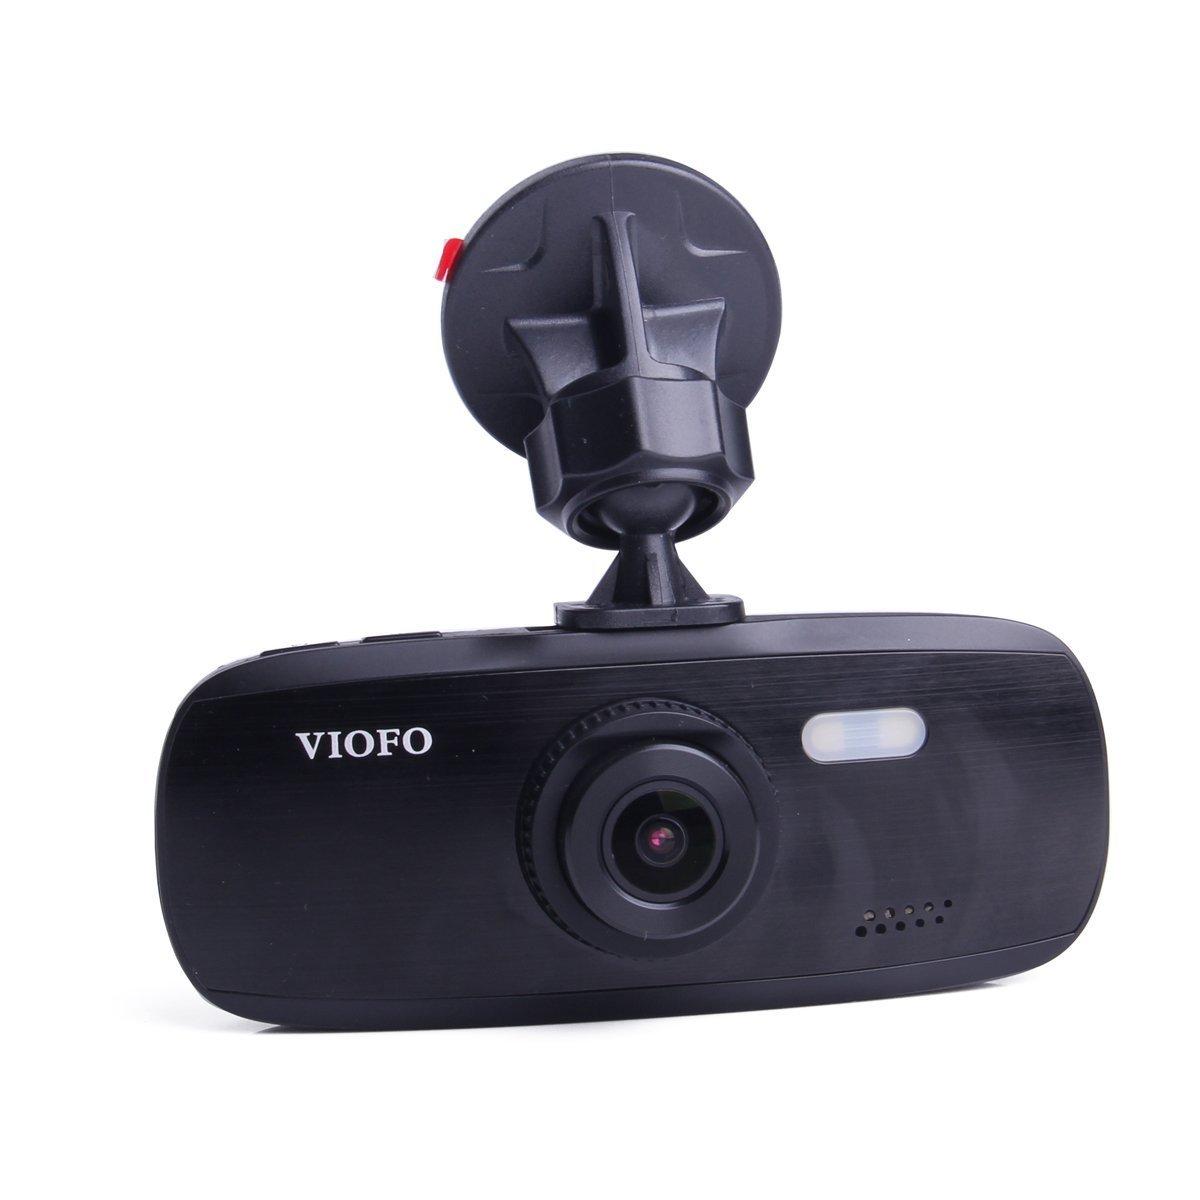 VIOFO G1W-S 2017 NT96650 + Sony IMX323 Car Dash Camera   Full 1080P HD Video & Audio Recording Car DVR Camera Recorder   G-Sensor Capabilities (New GPS Option)